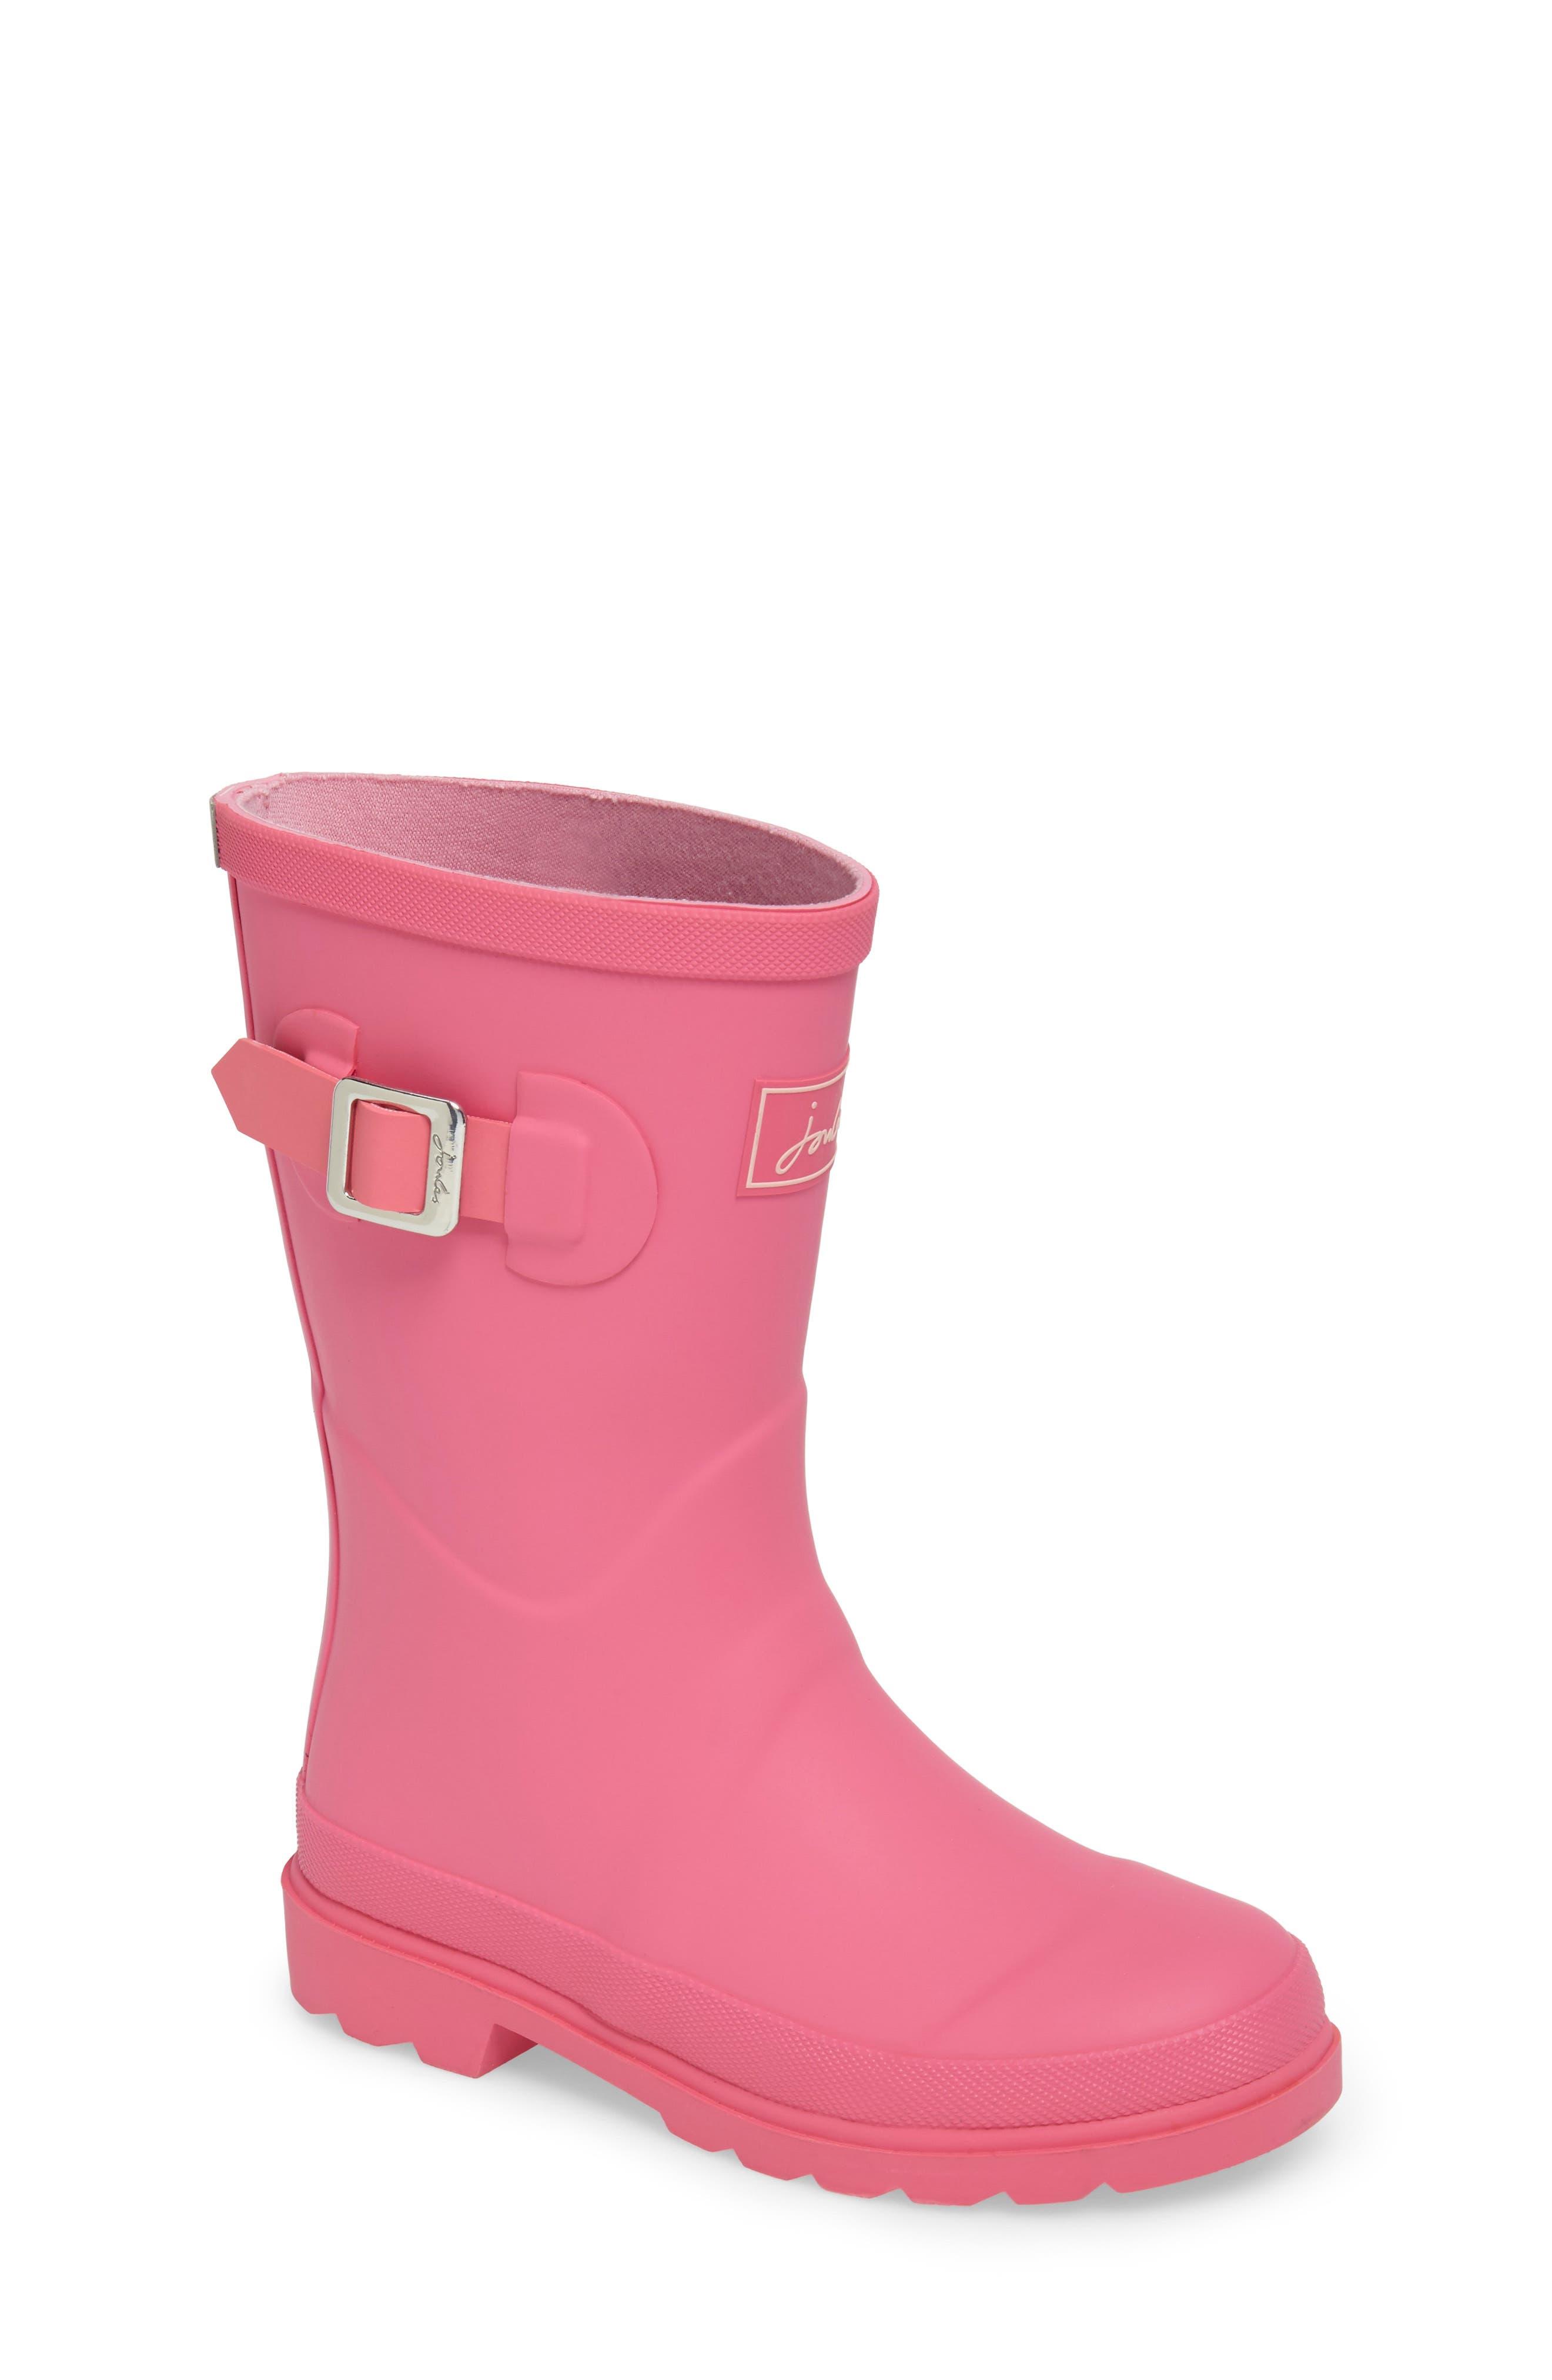 Main Image - Joules Welly Matte Waterproof Rain Boot (Toddler, Little Kid & Big Kid)